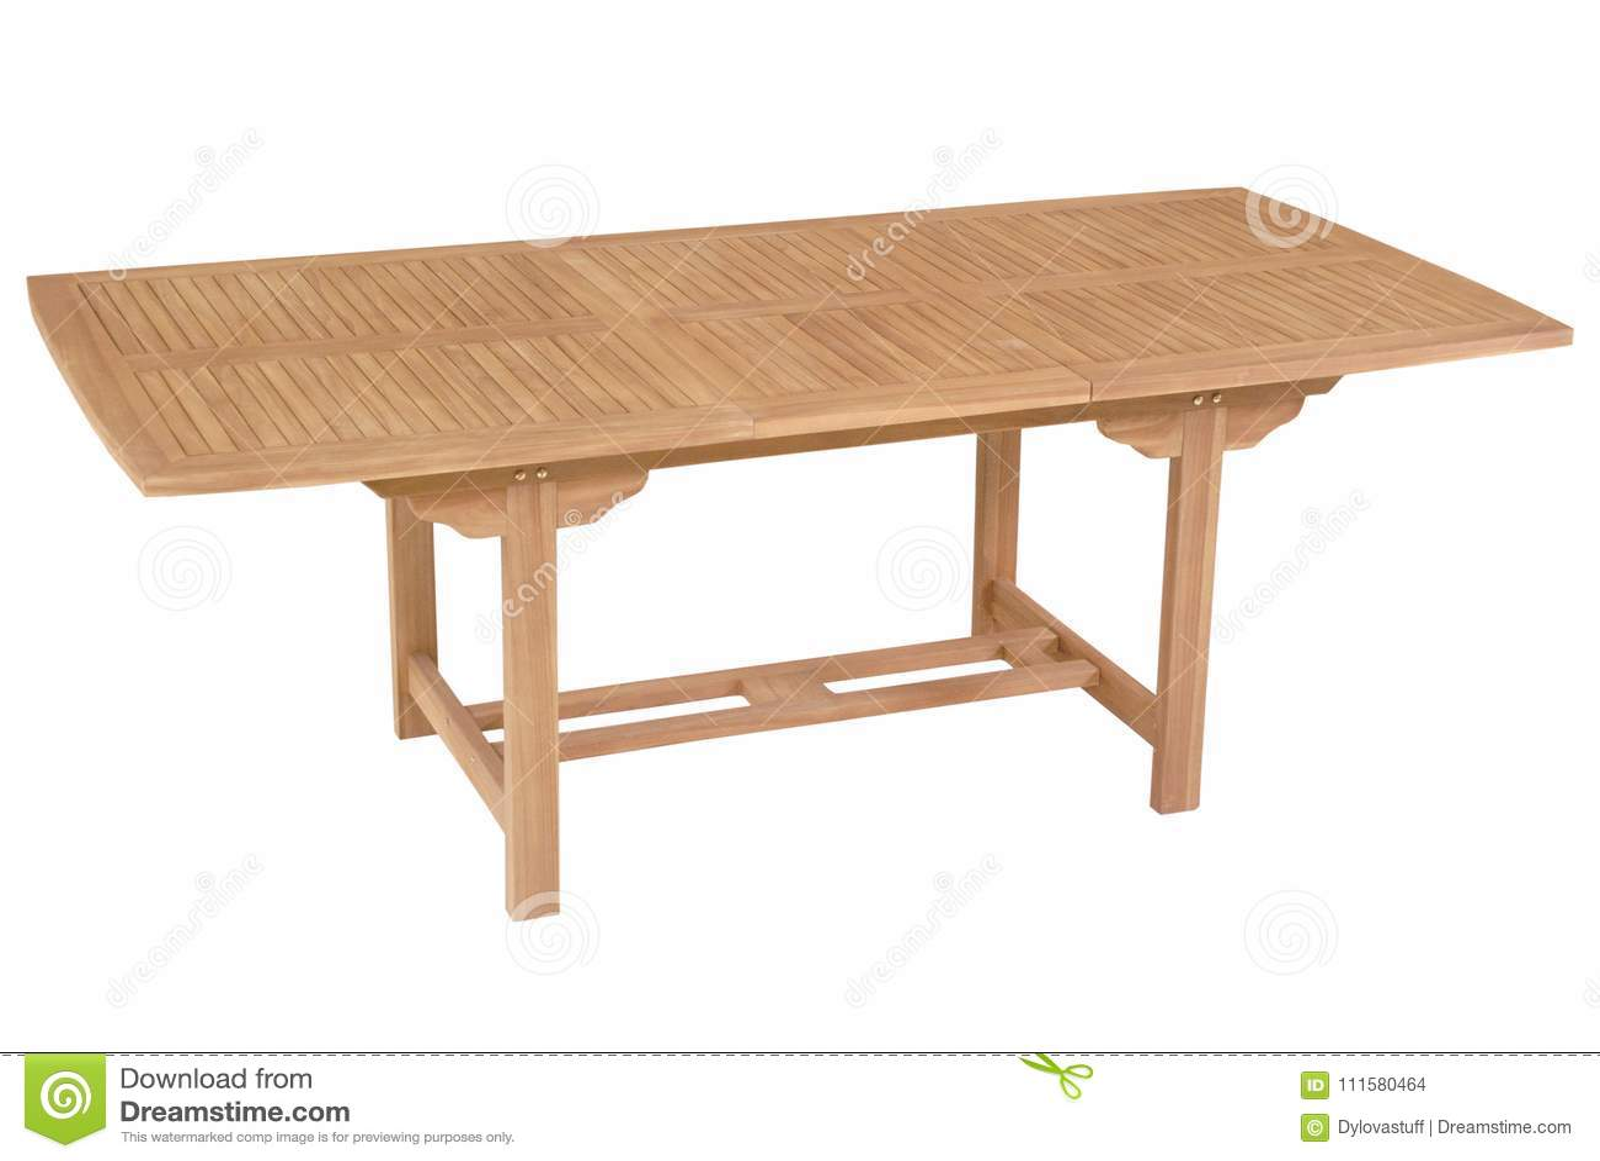 teak table and chairs garden bar style adirondack furniture set stock photo